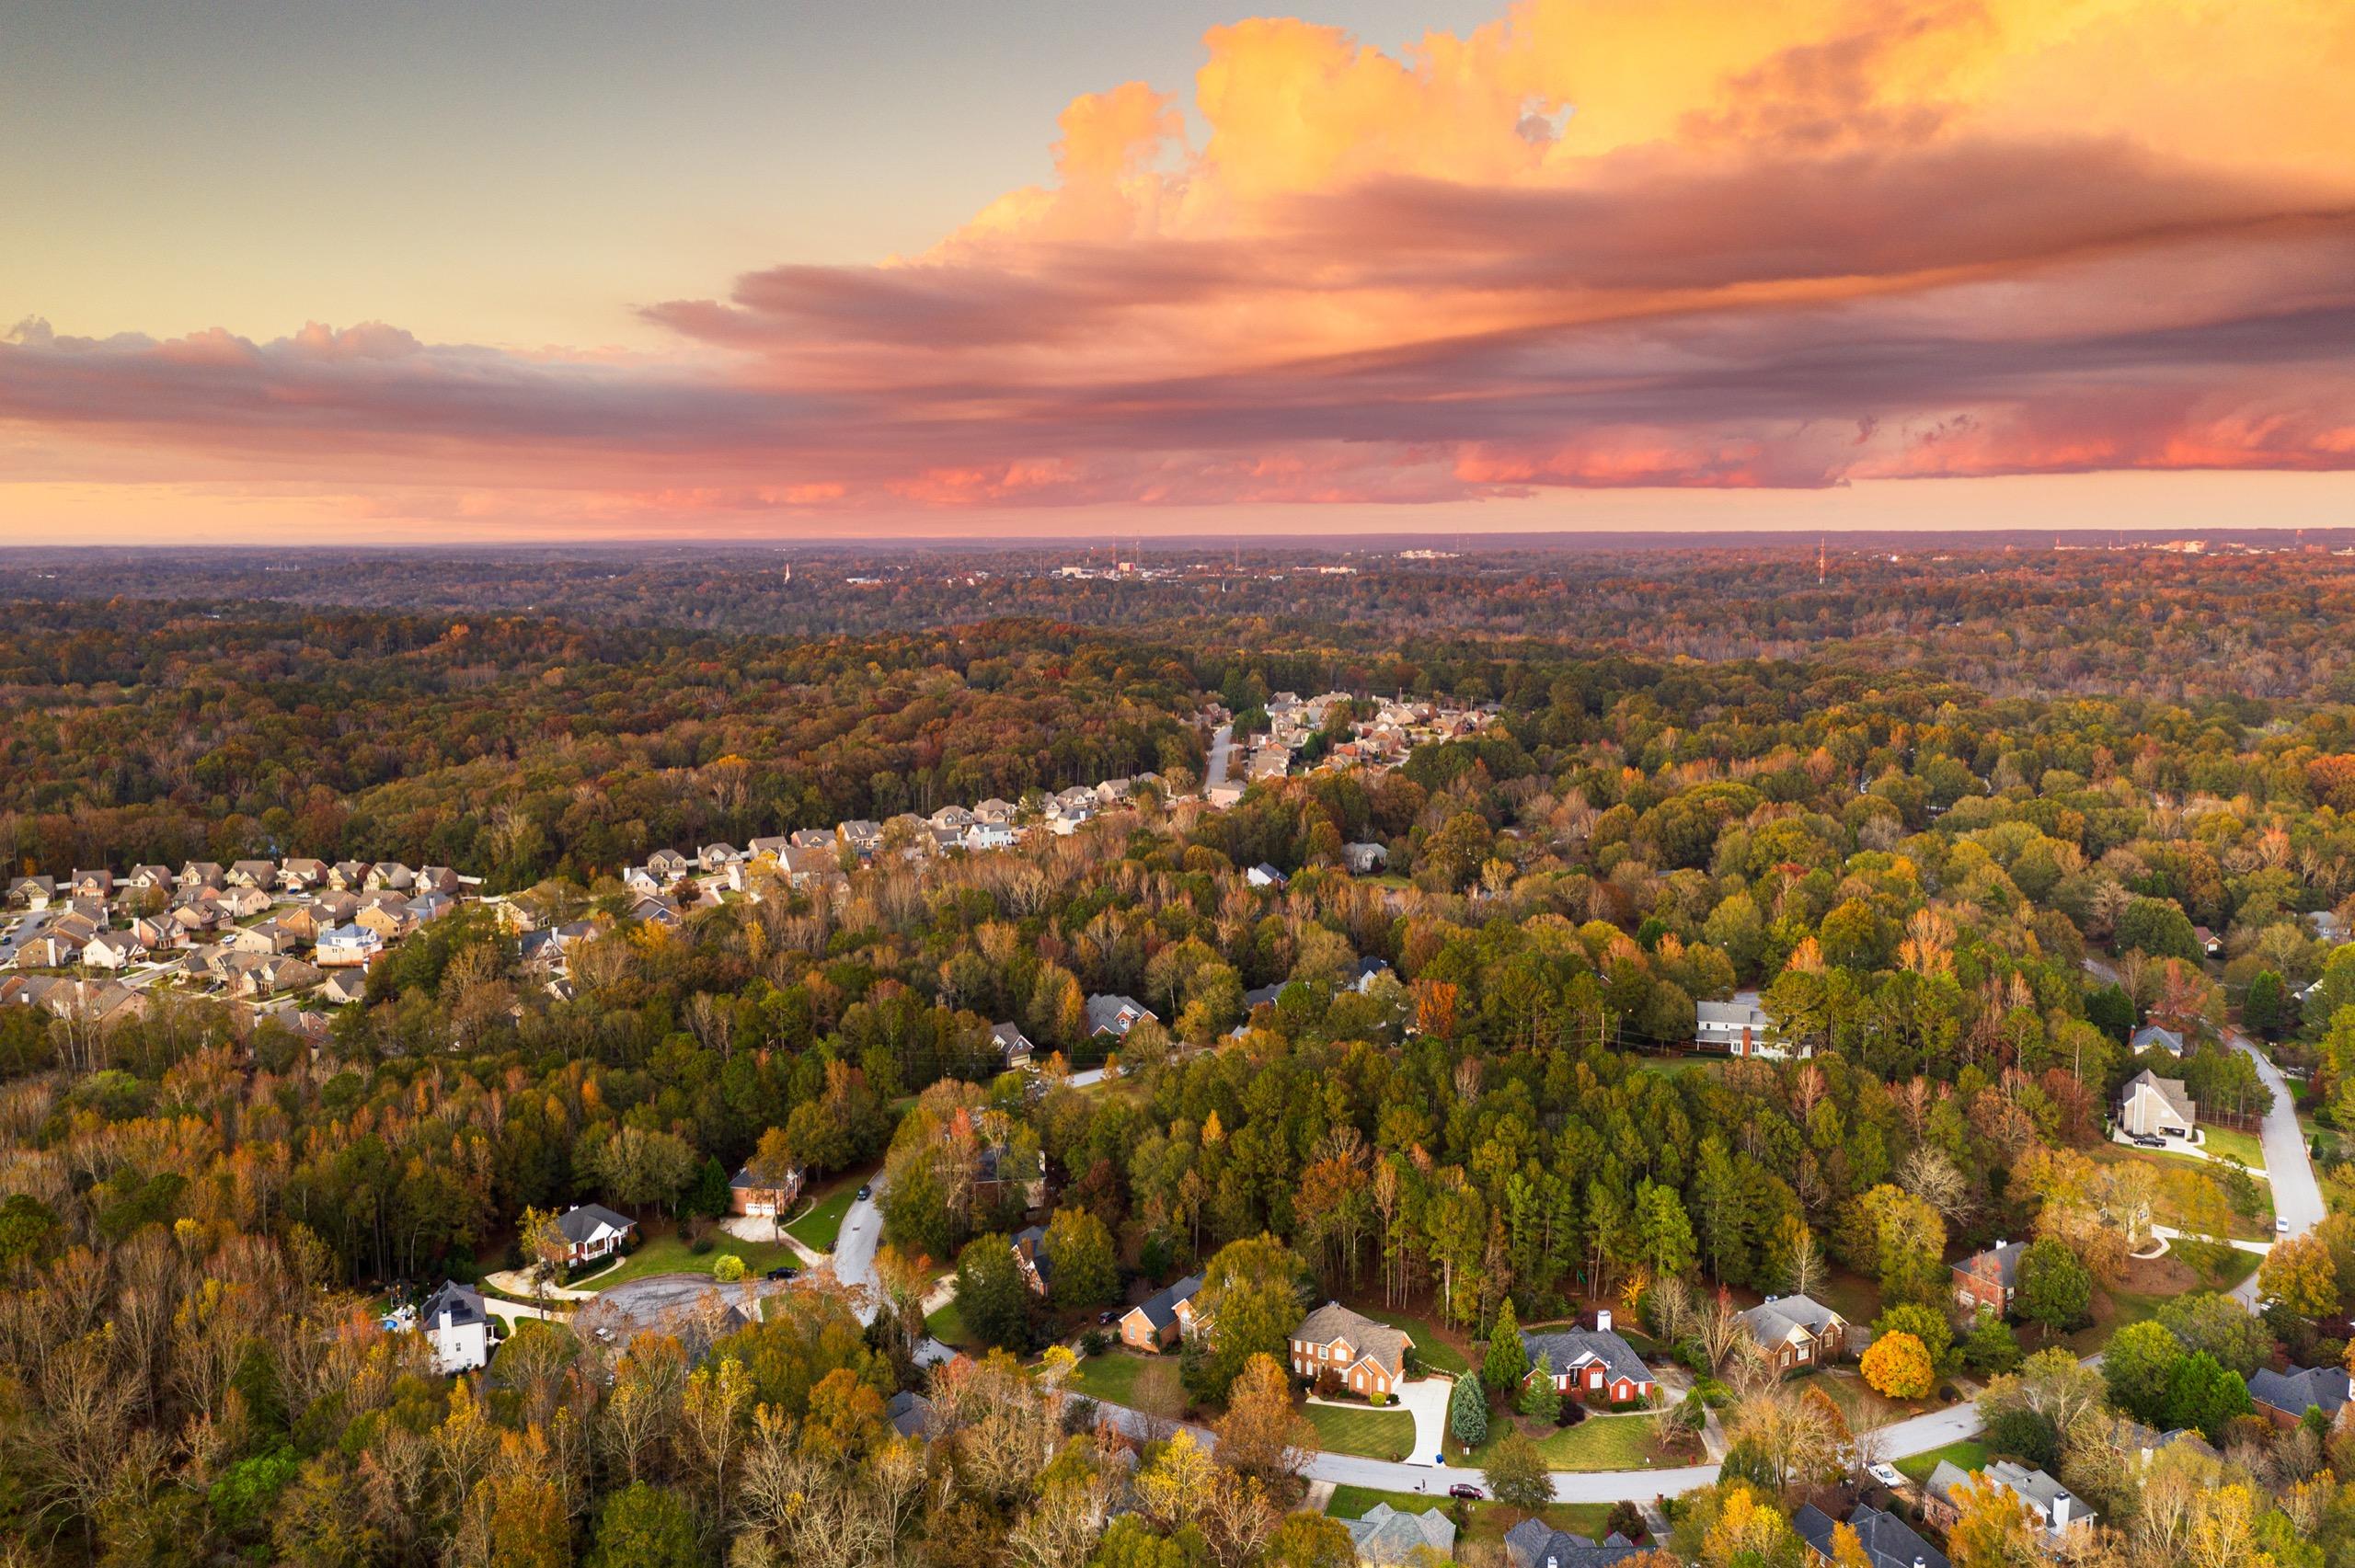 beautiful neighborhood in sunset